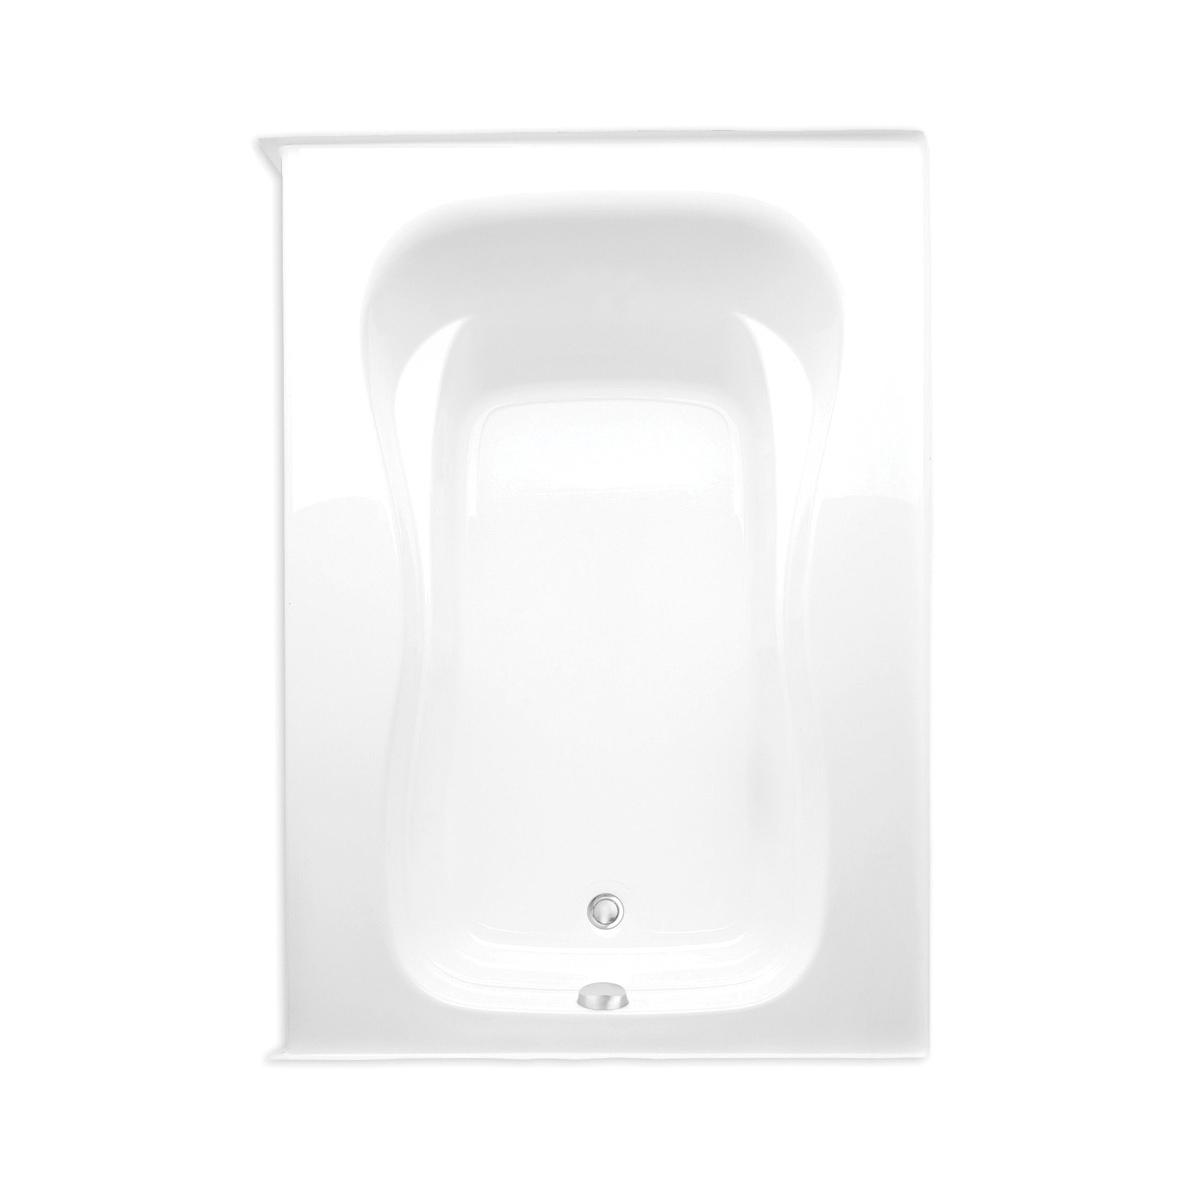 Aquatic 826541989327 Marratta Element 7260420VL-WH Builders' Choice Bathtub, Soaking, 60 in L x 43 in W, Left Hand Drain, White